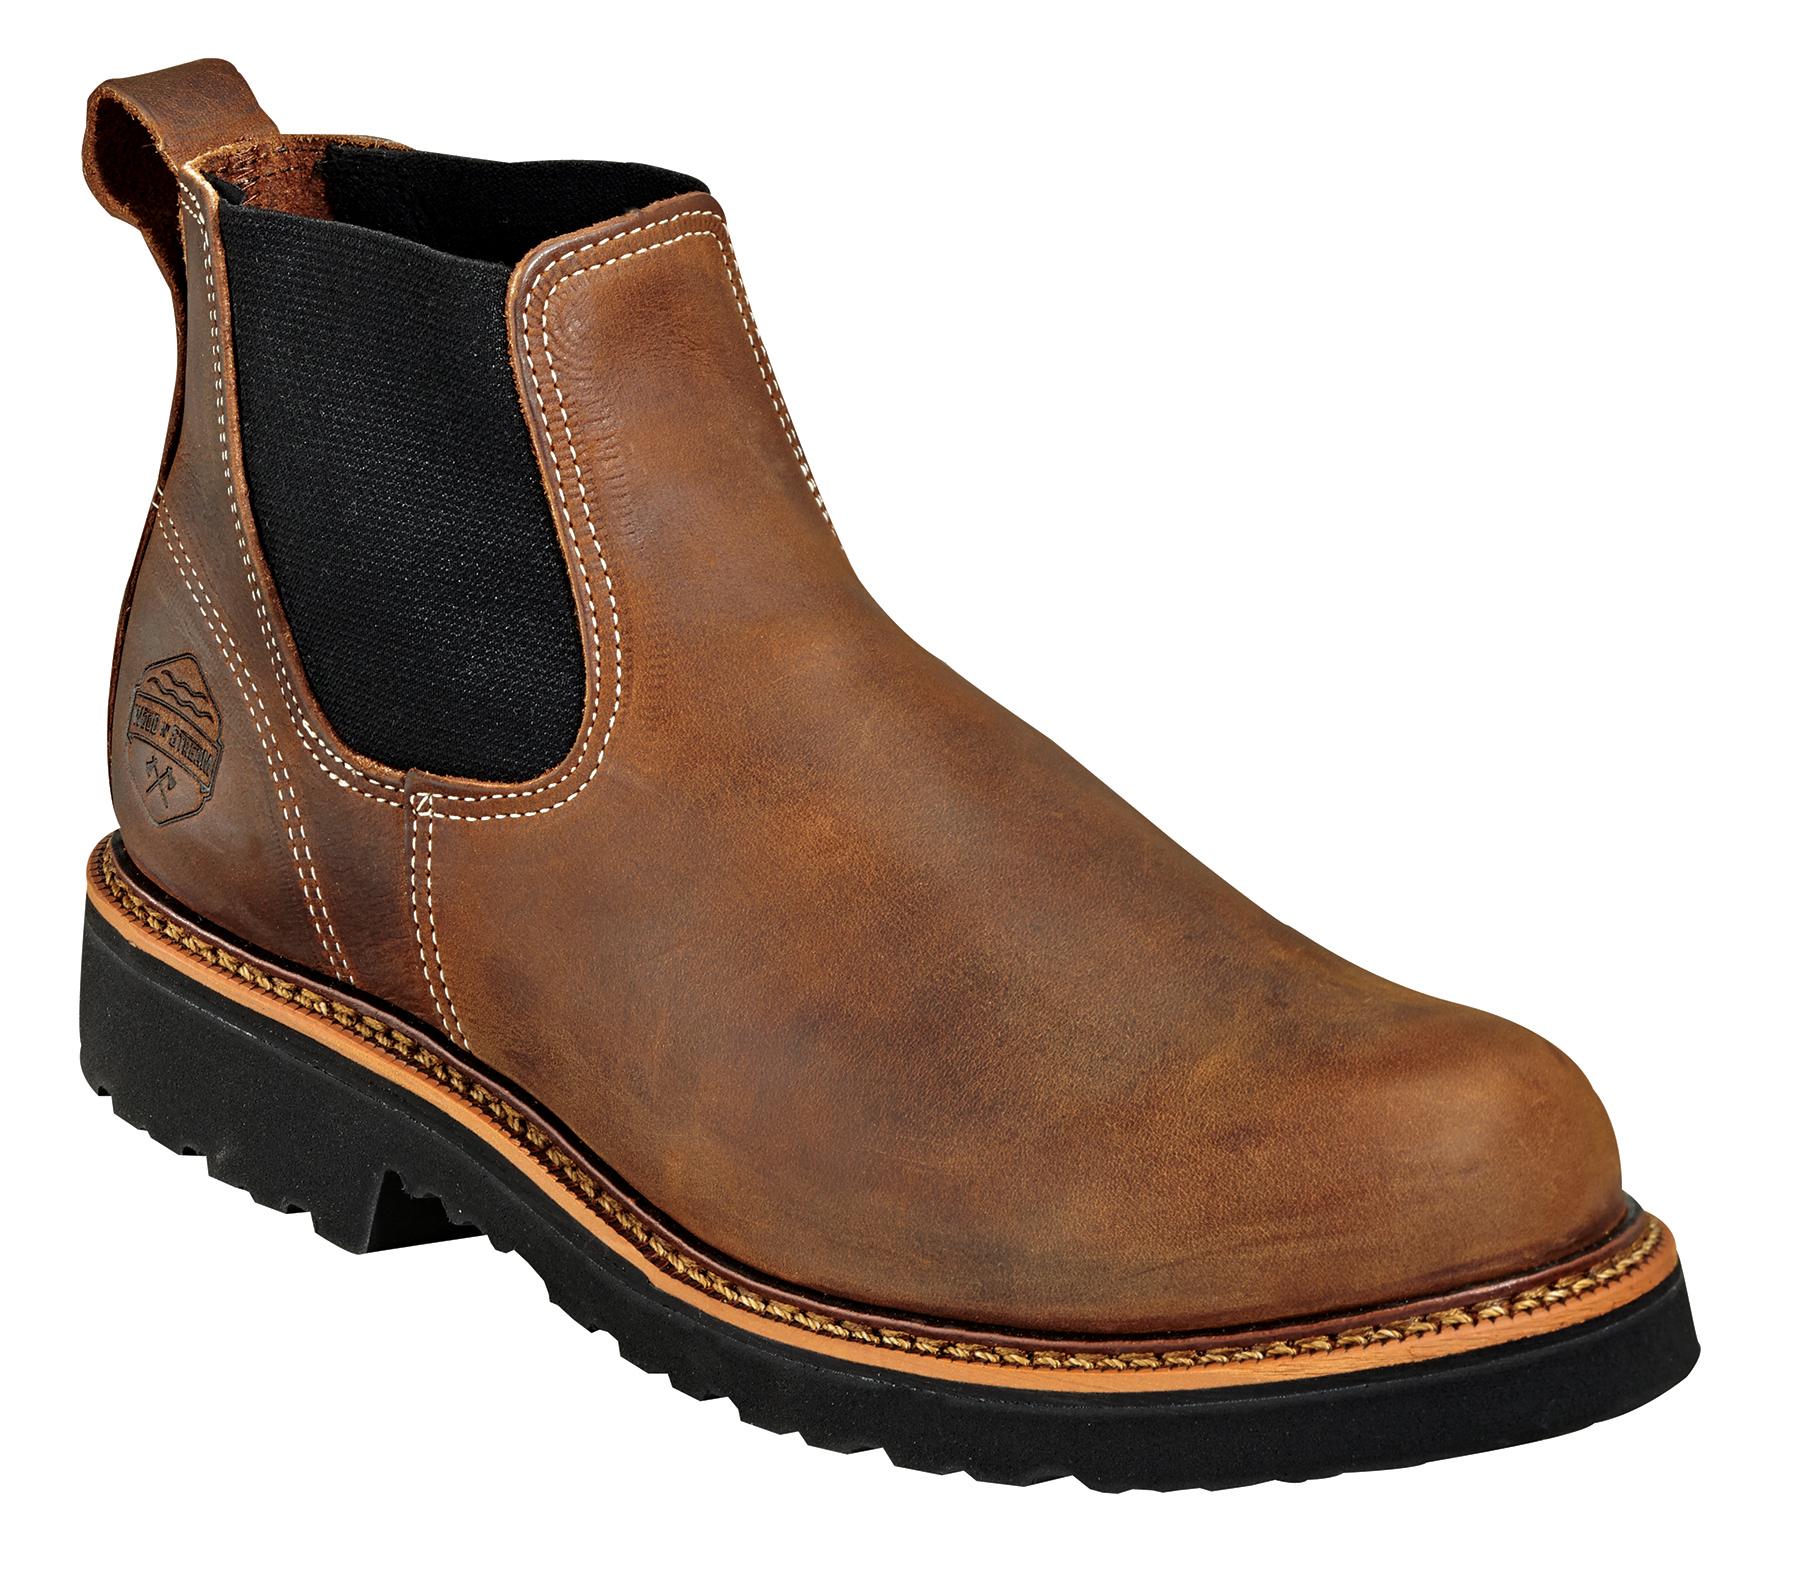 2832843f9b6 Weinbrenner Shoe Company / Thorogood Shoes